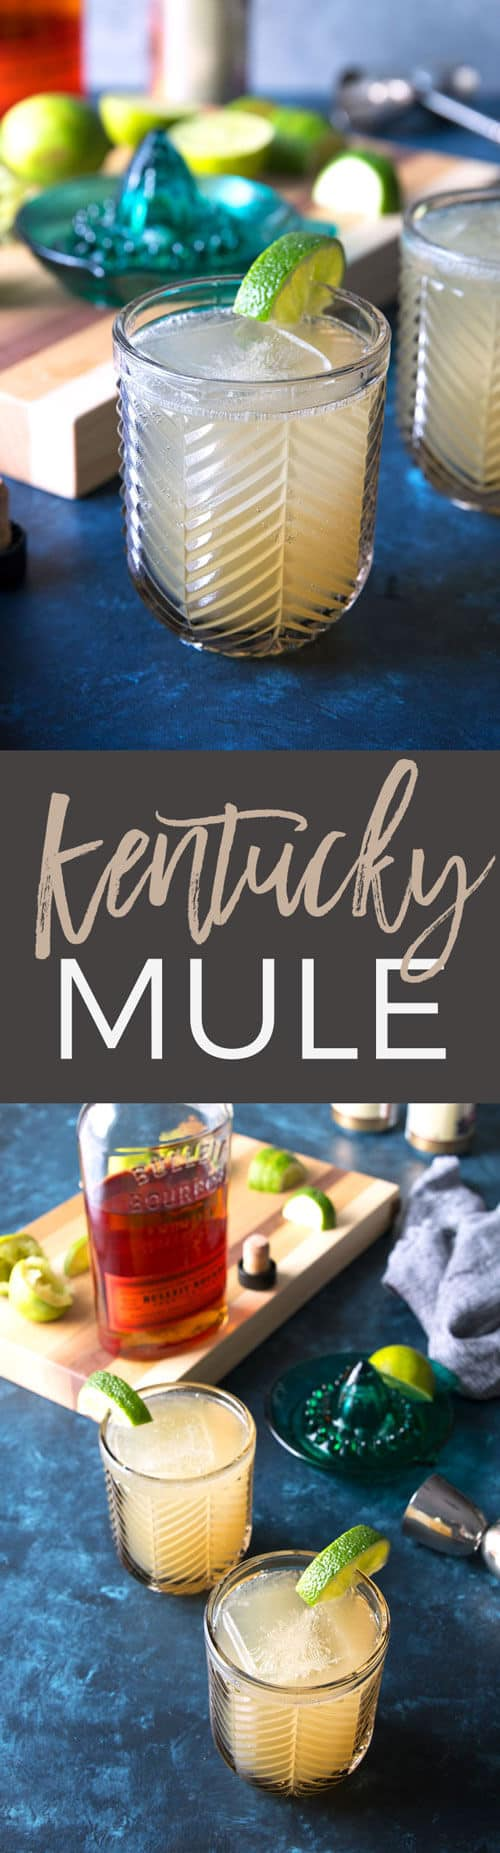 Kentucky Mule recipe pin